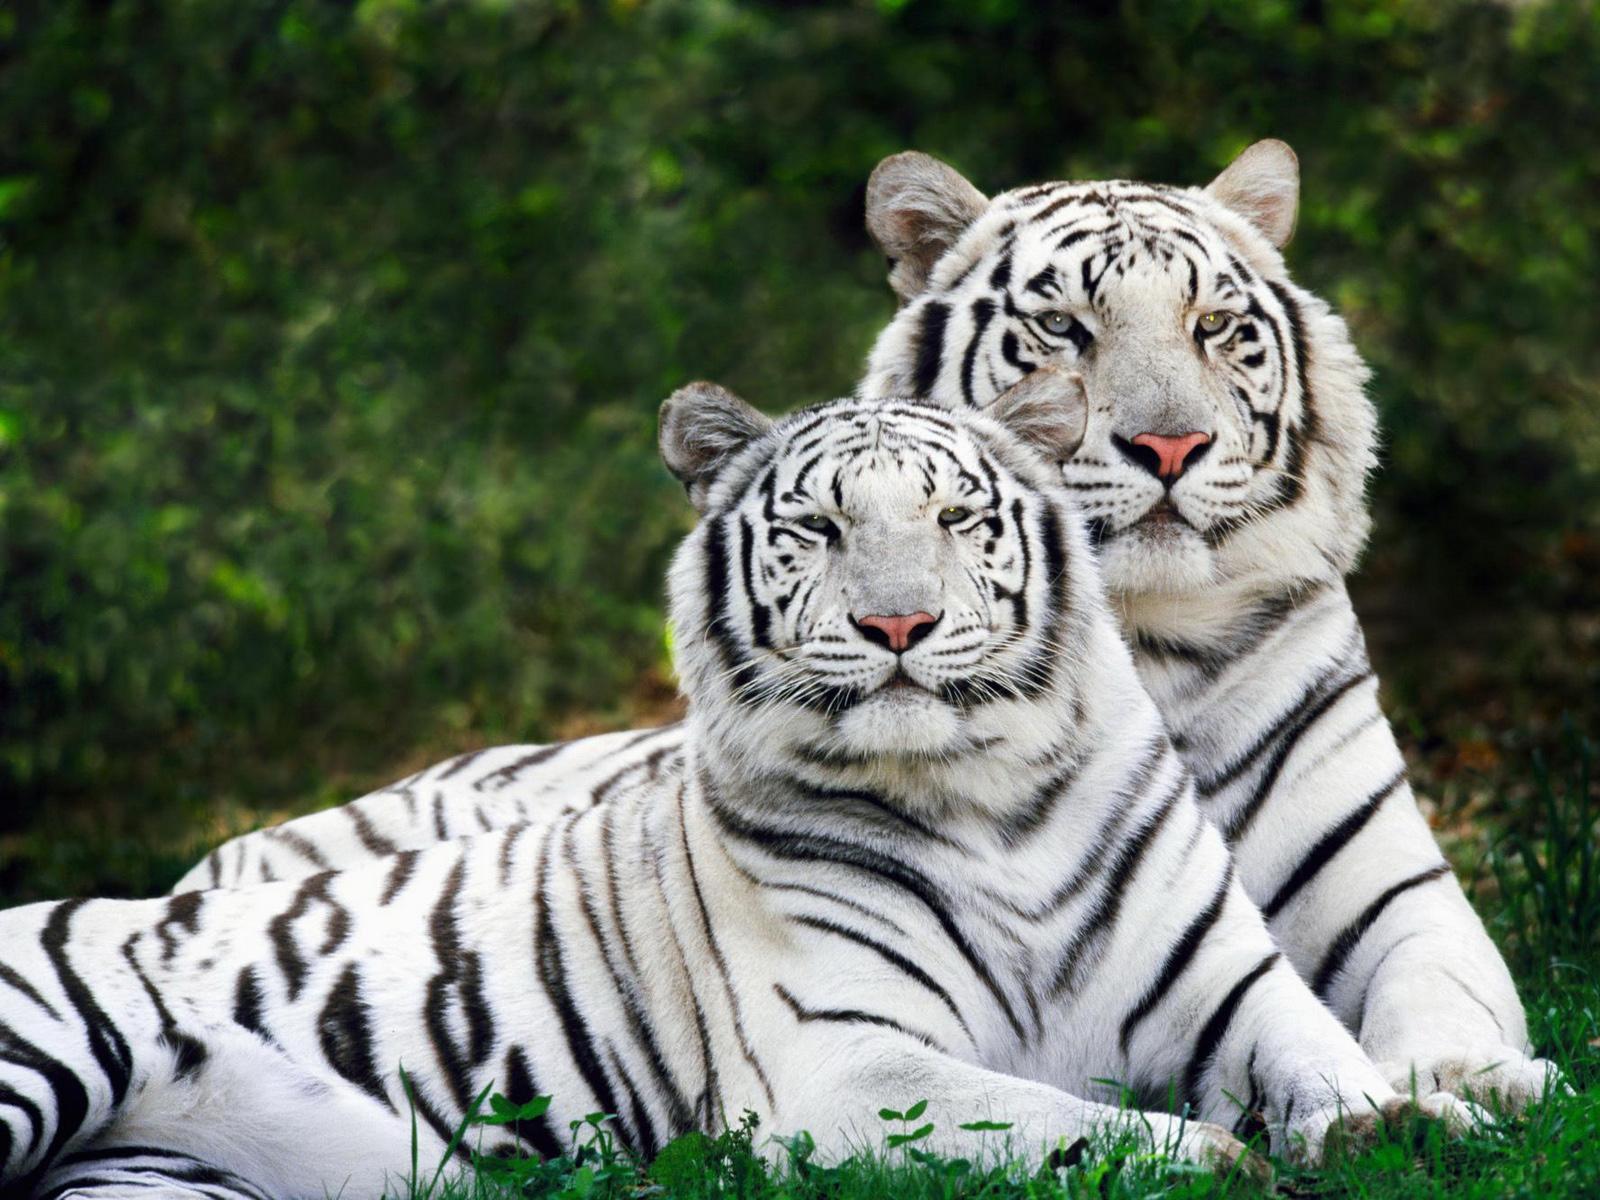 Desktop Wallpapers Backgrounds Tiger Wallpapers 1600x1200